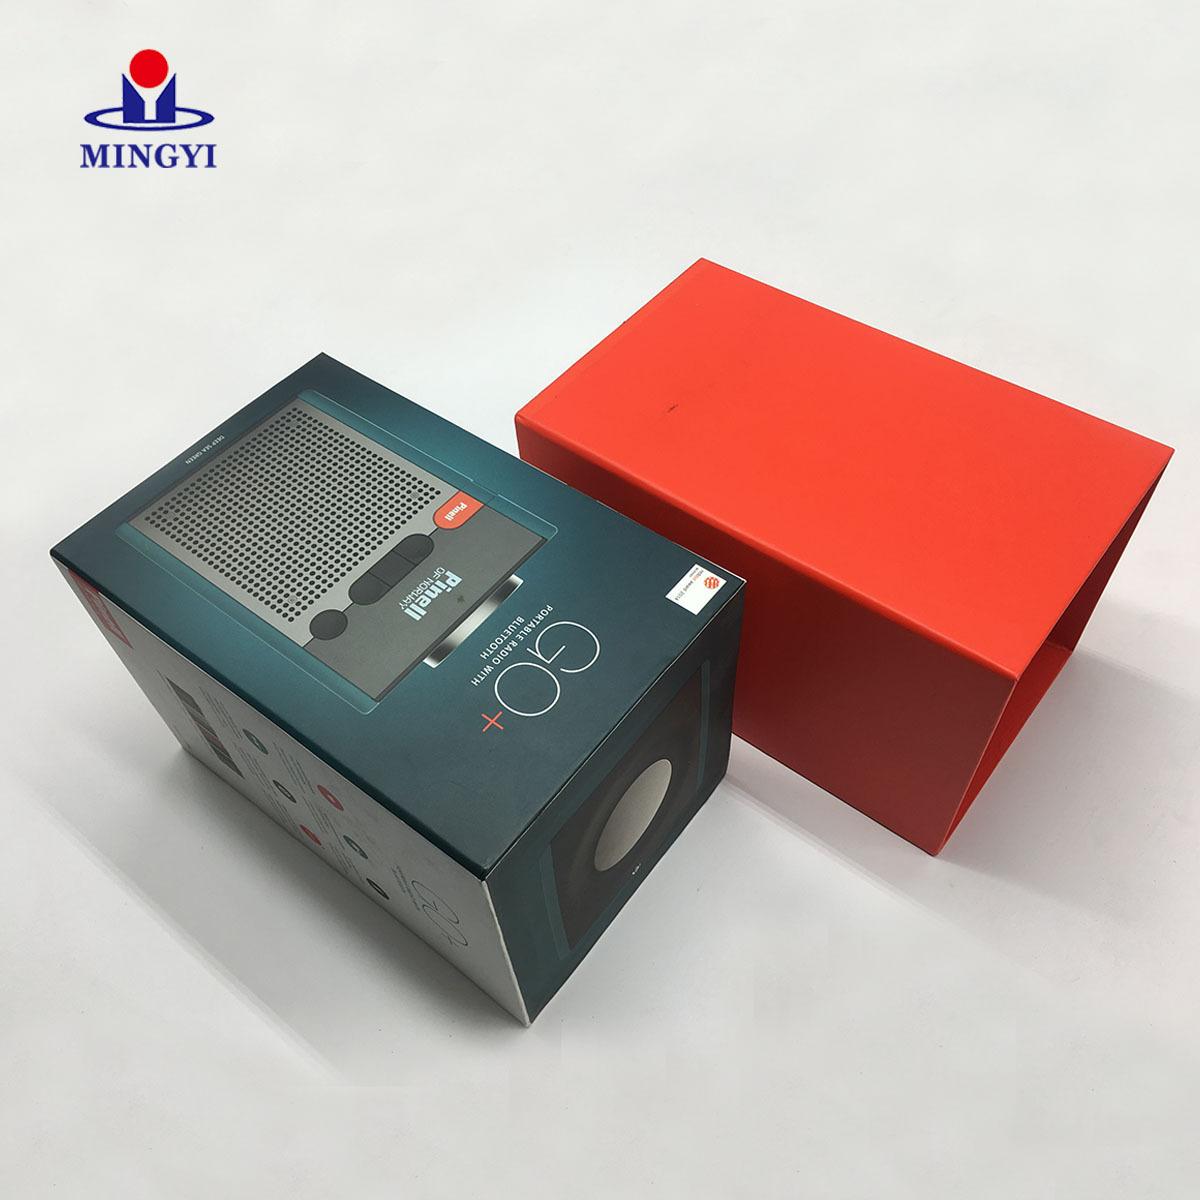 Mingyi Printing High grade  grey board  packaging Cardboard Gift Box image3